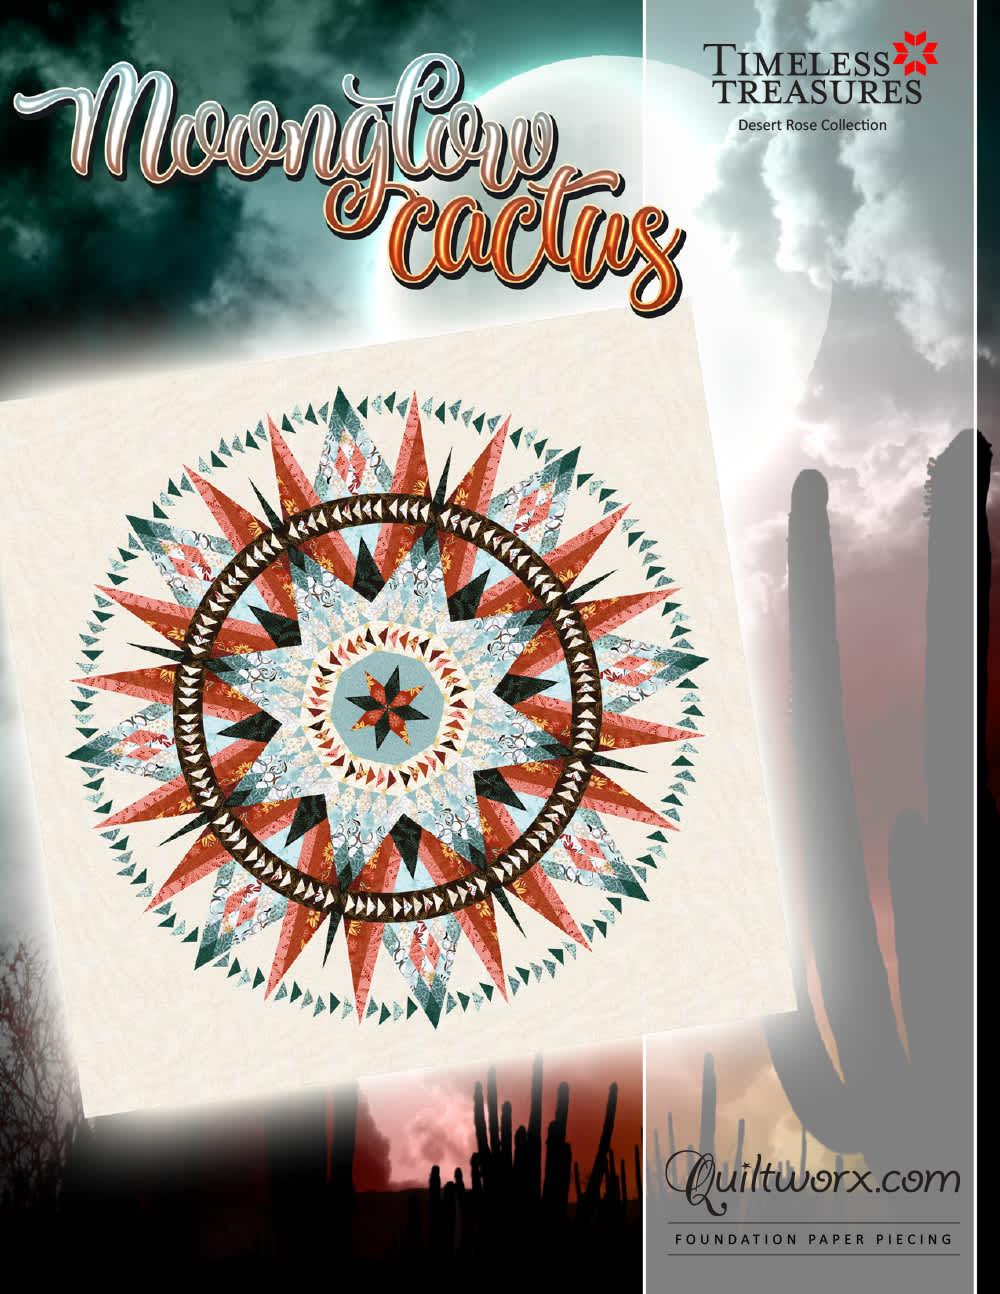 Moonglow Cactus